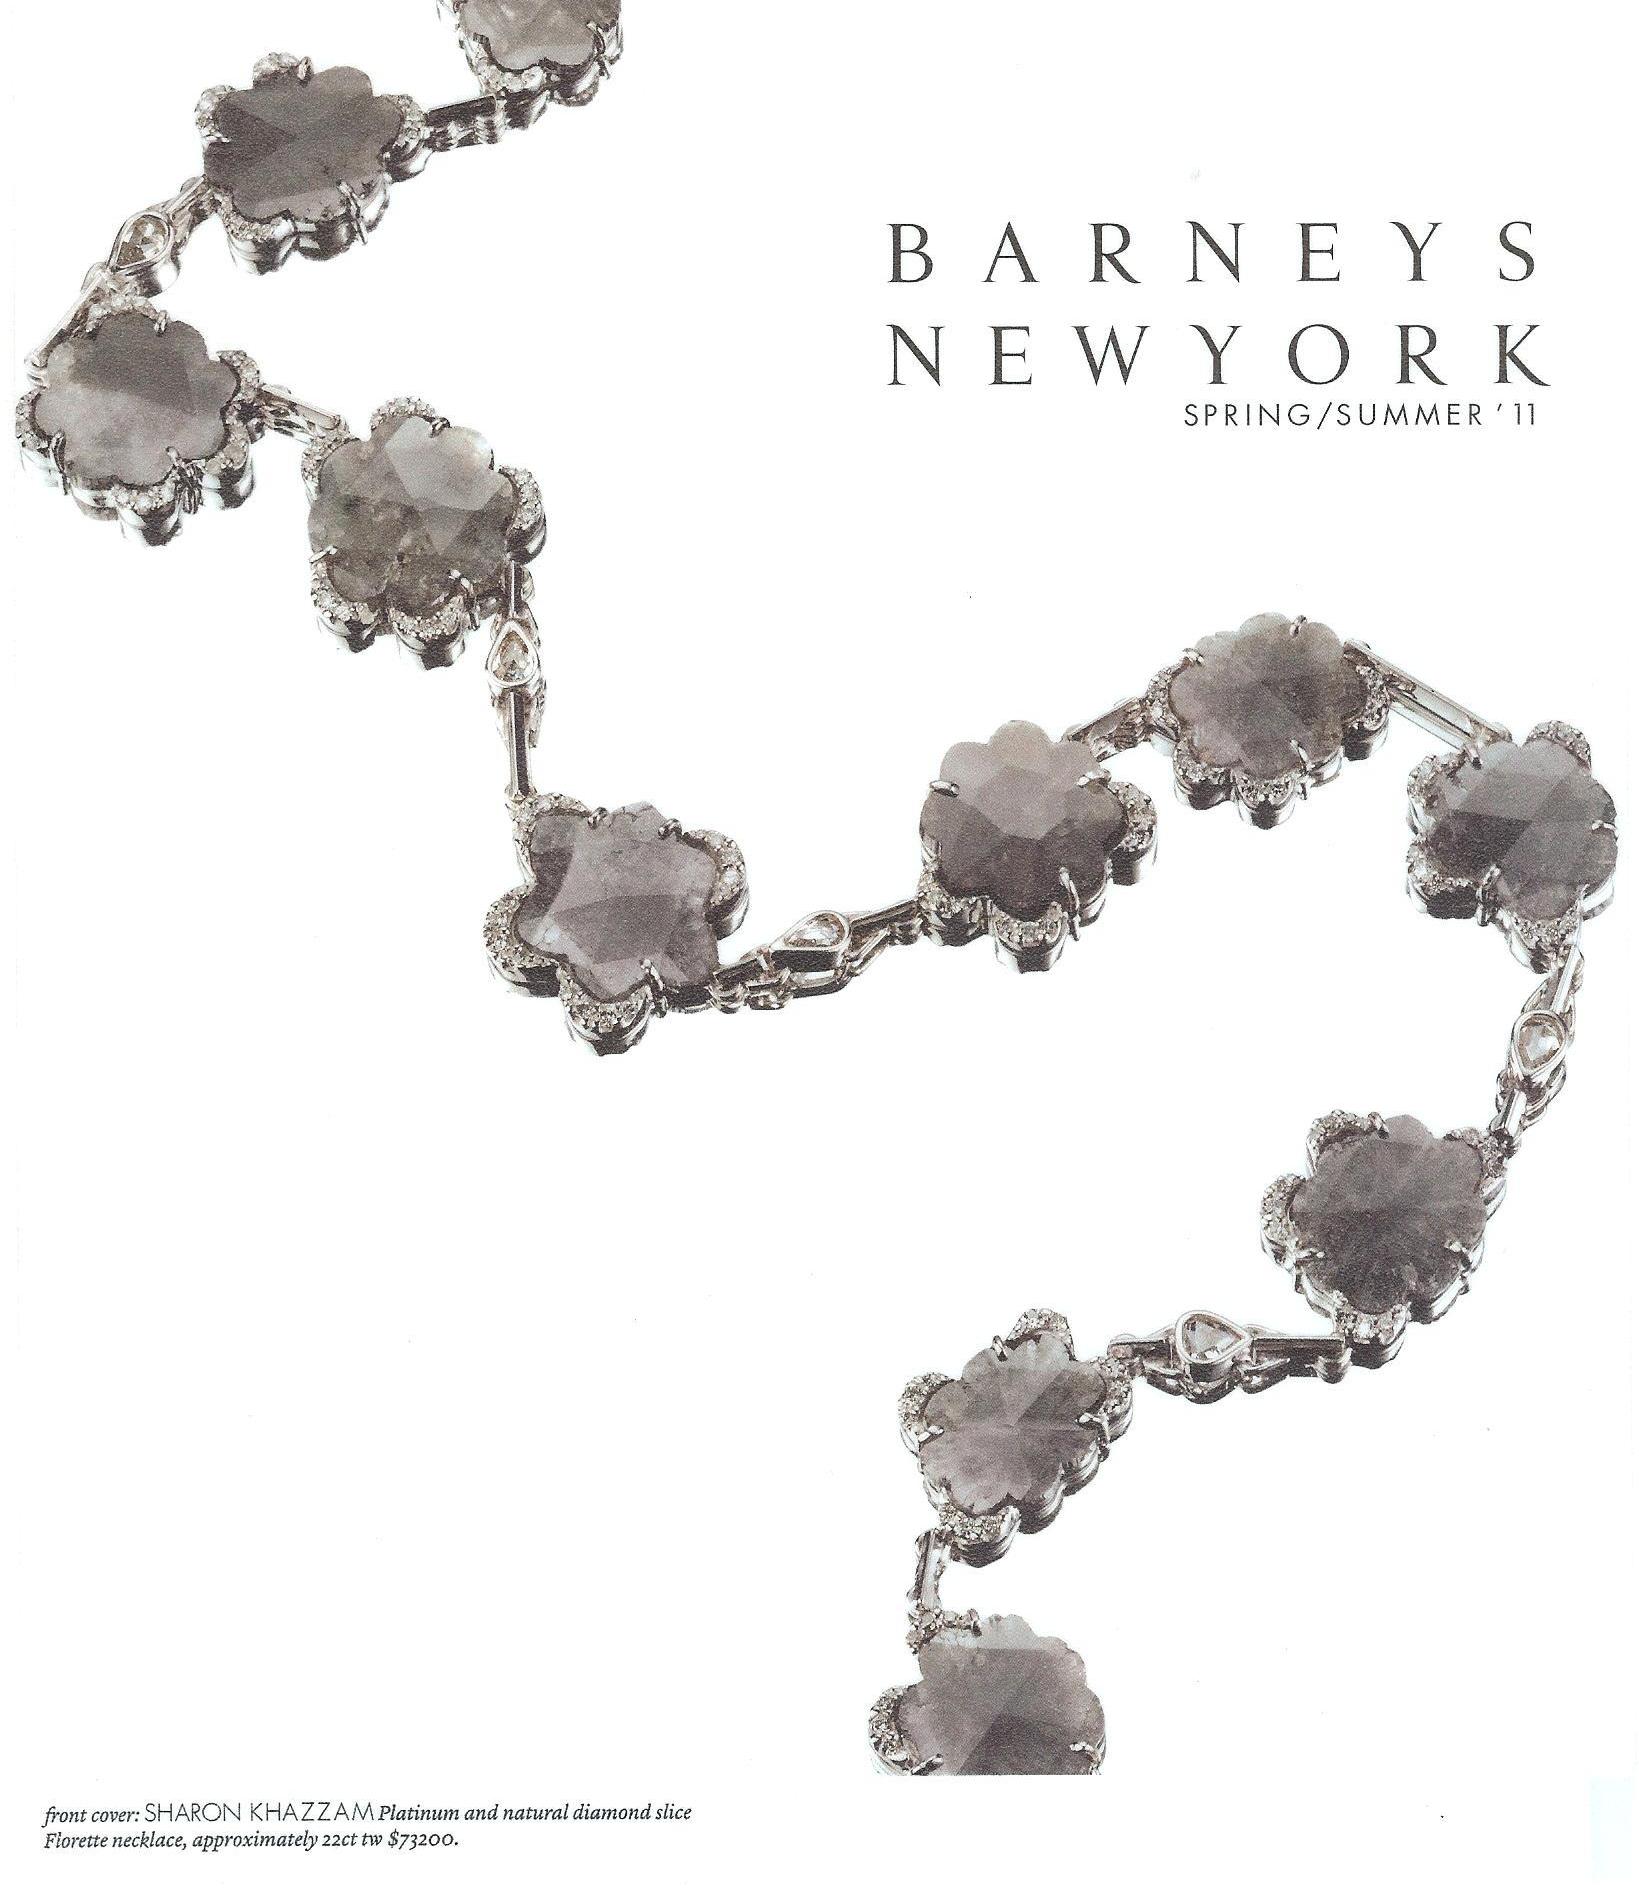 2011-Barneys Mailer- Dia Slice Bracelet.jpg